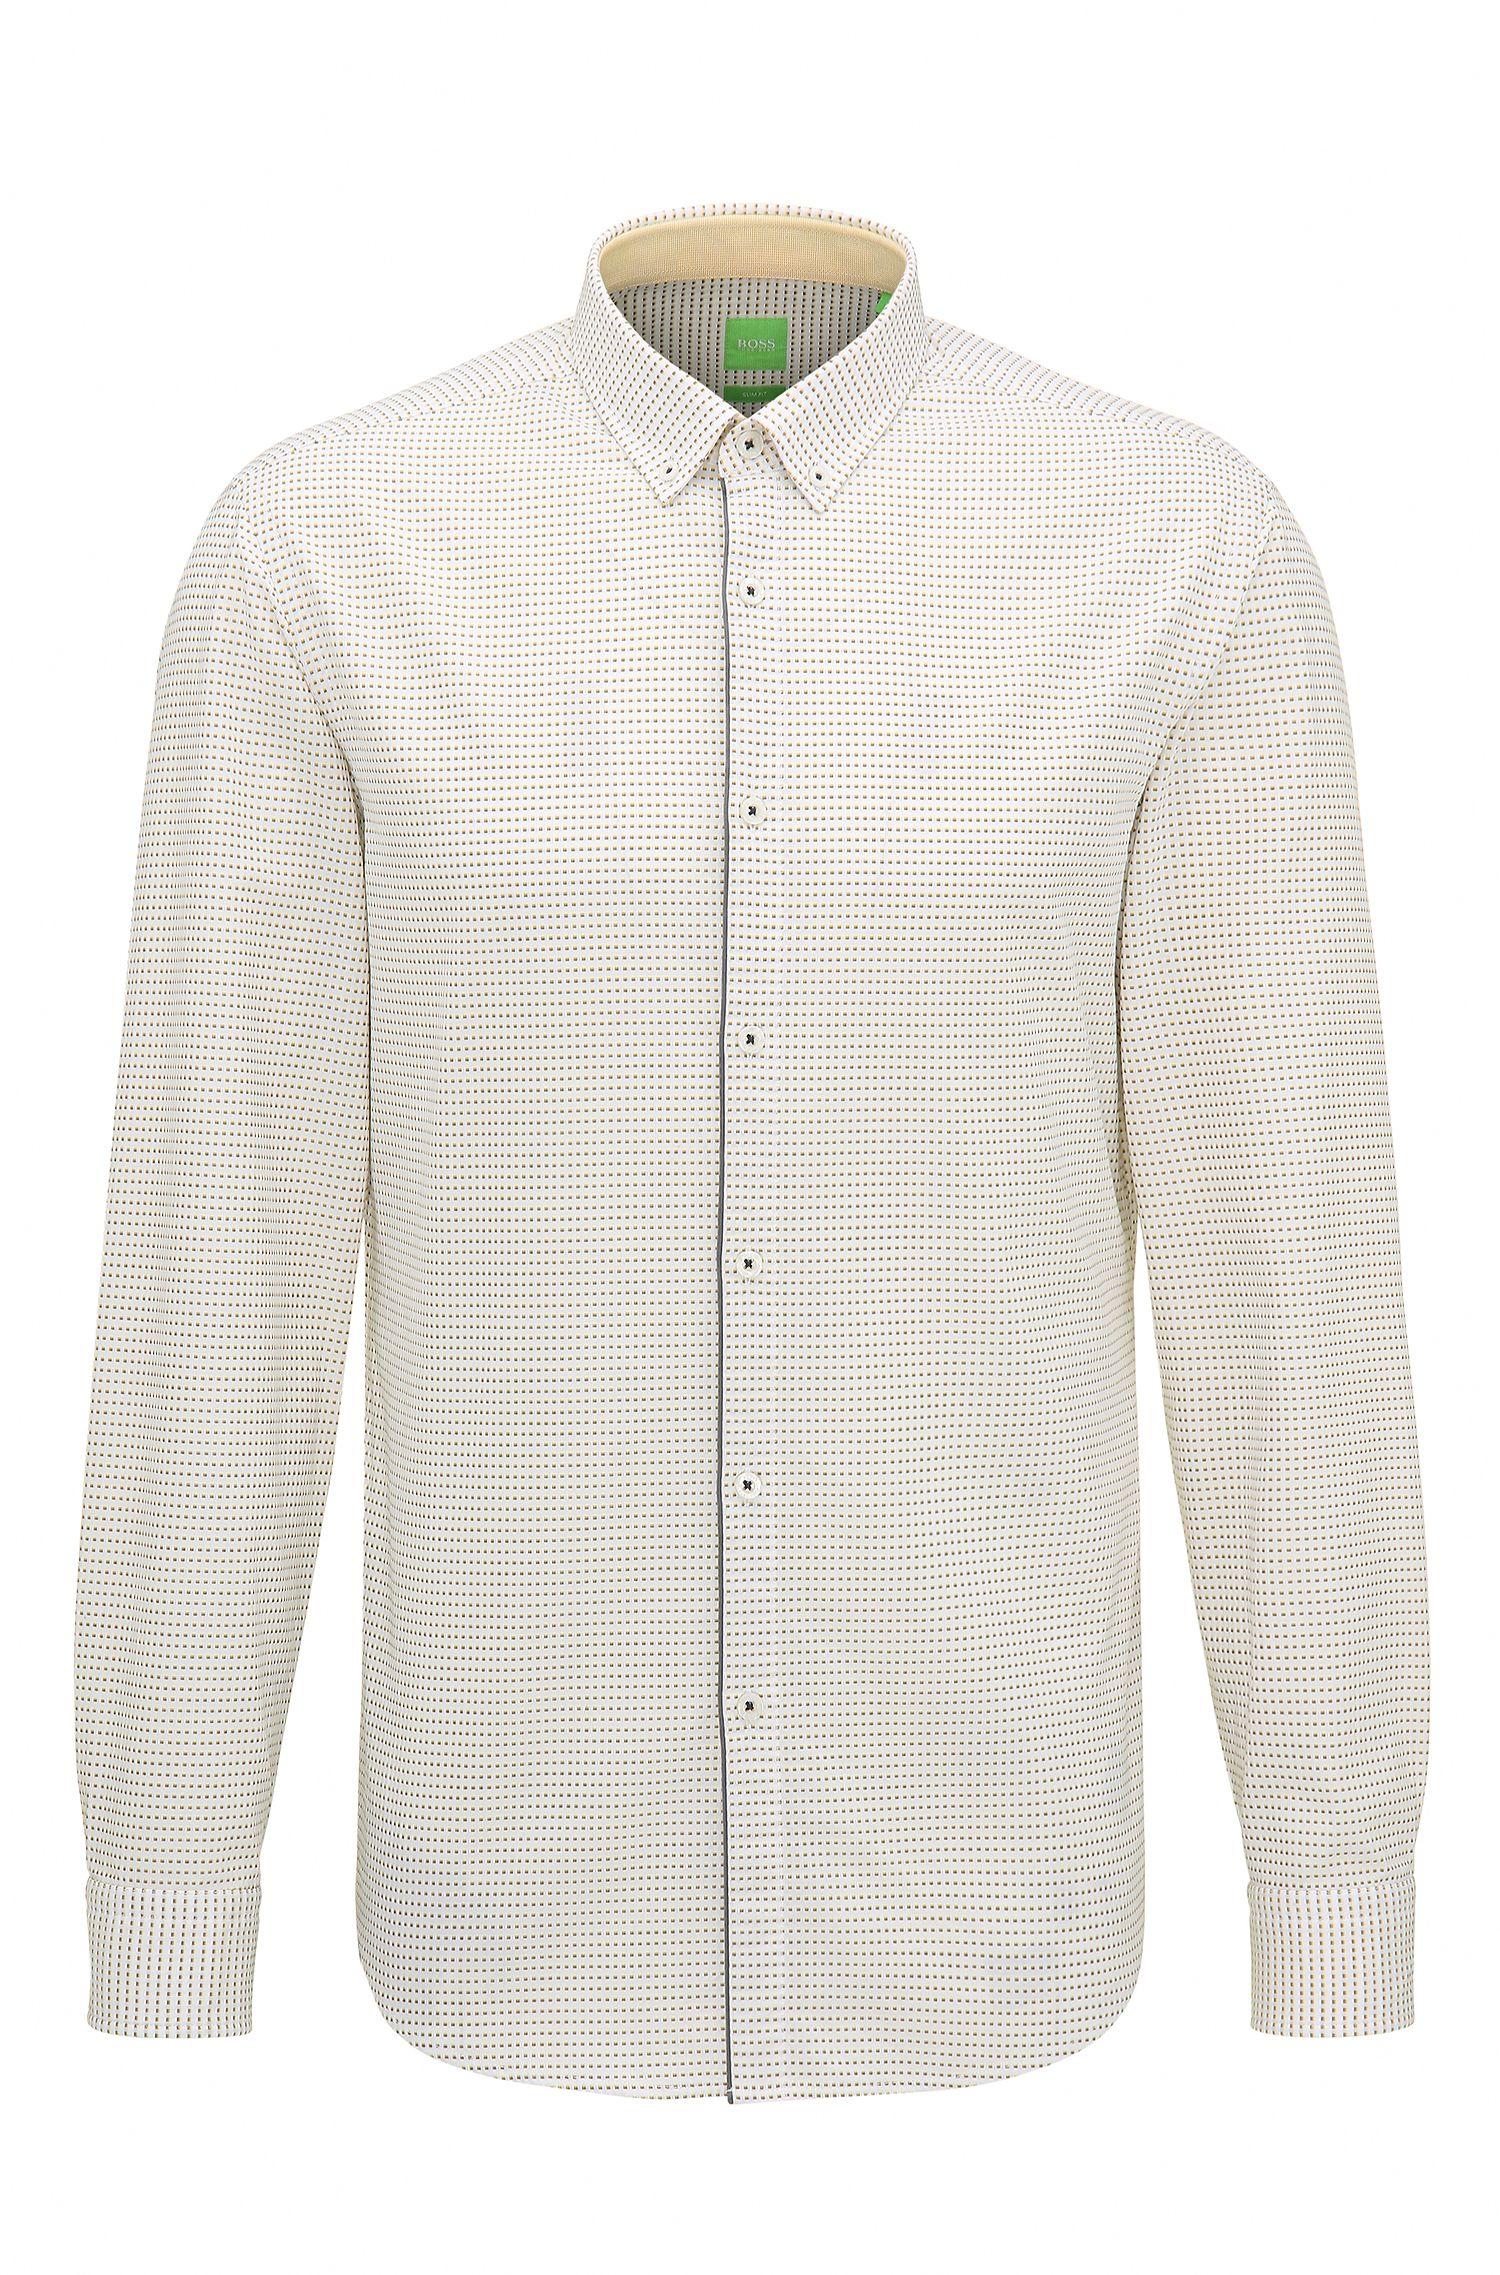 'C-Baltero' | Slim Fit, Micro-Square Dot Cotton Button-Down Shirt